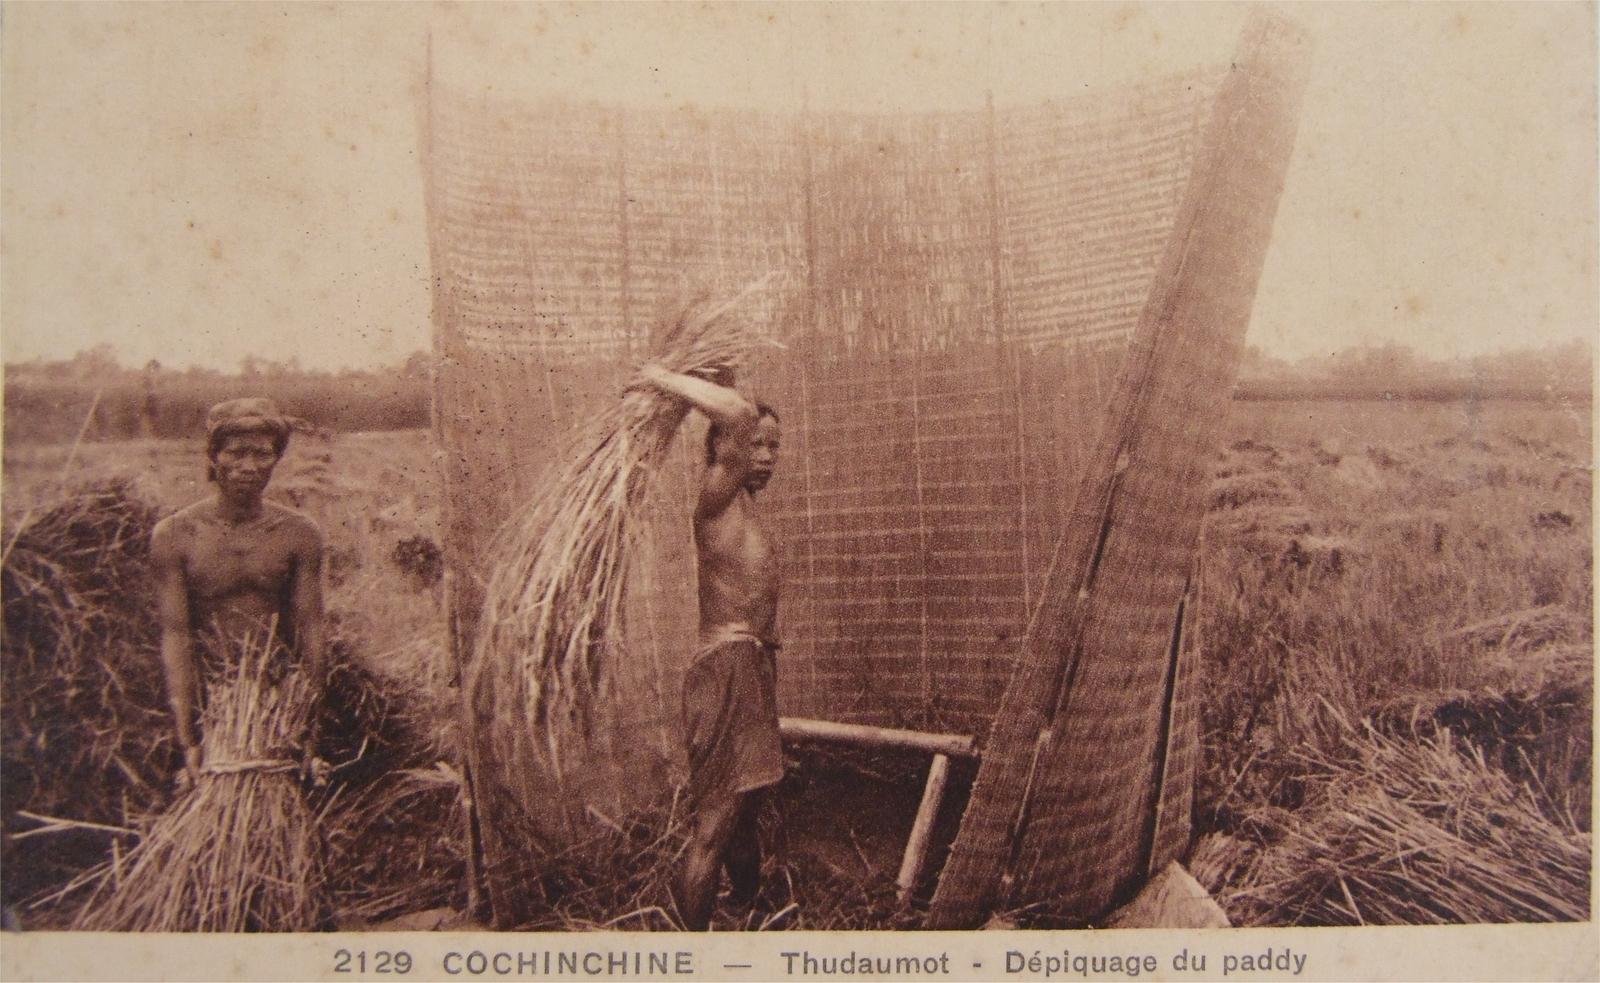 -  Cochinchine - Thudaumot - Dépiquage du Paddy (1936)